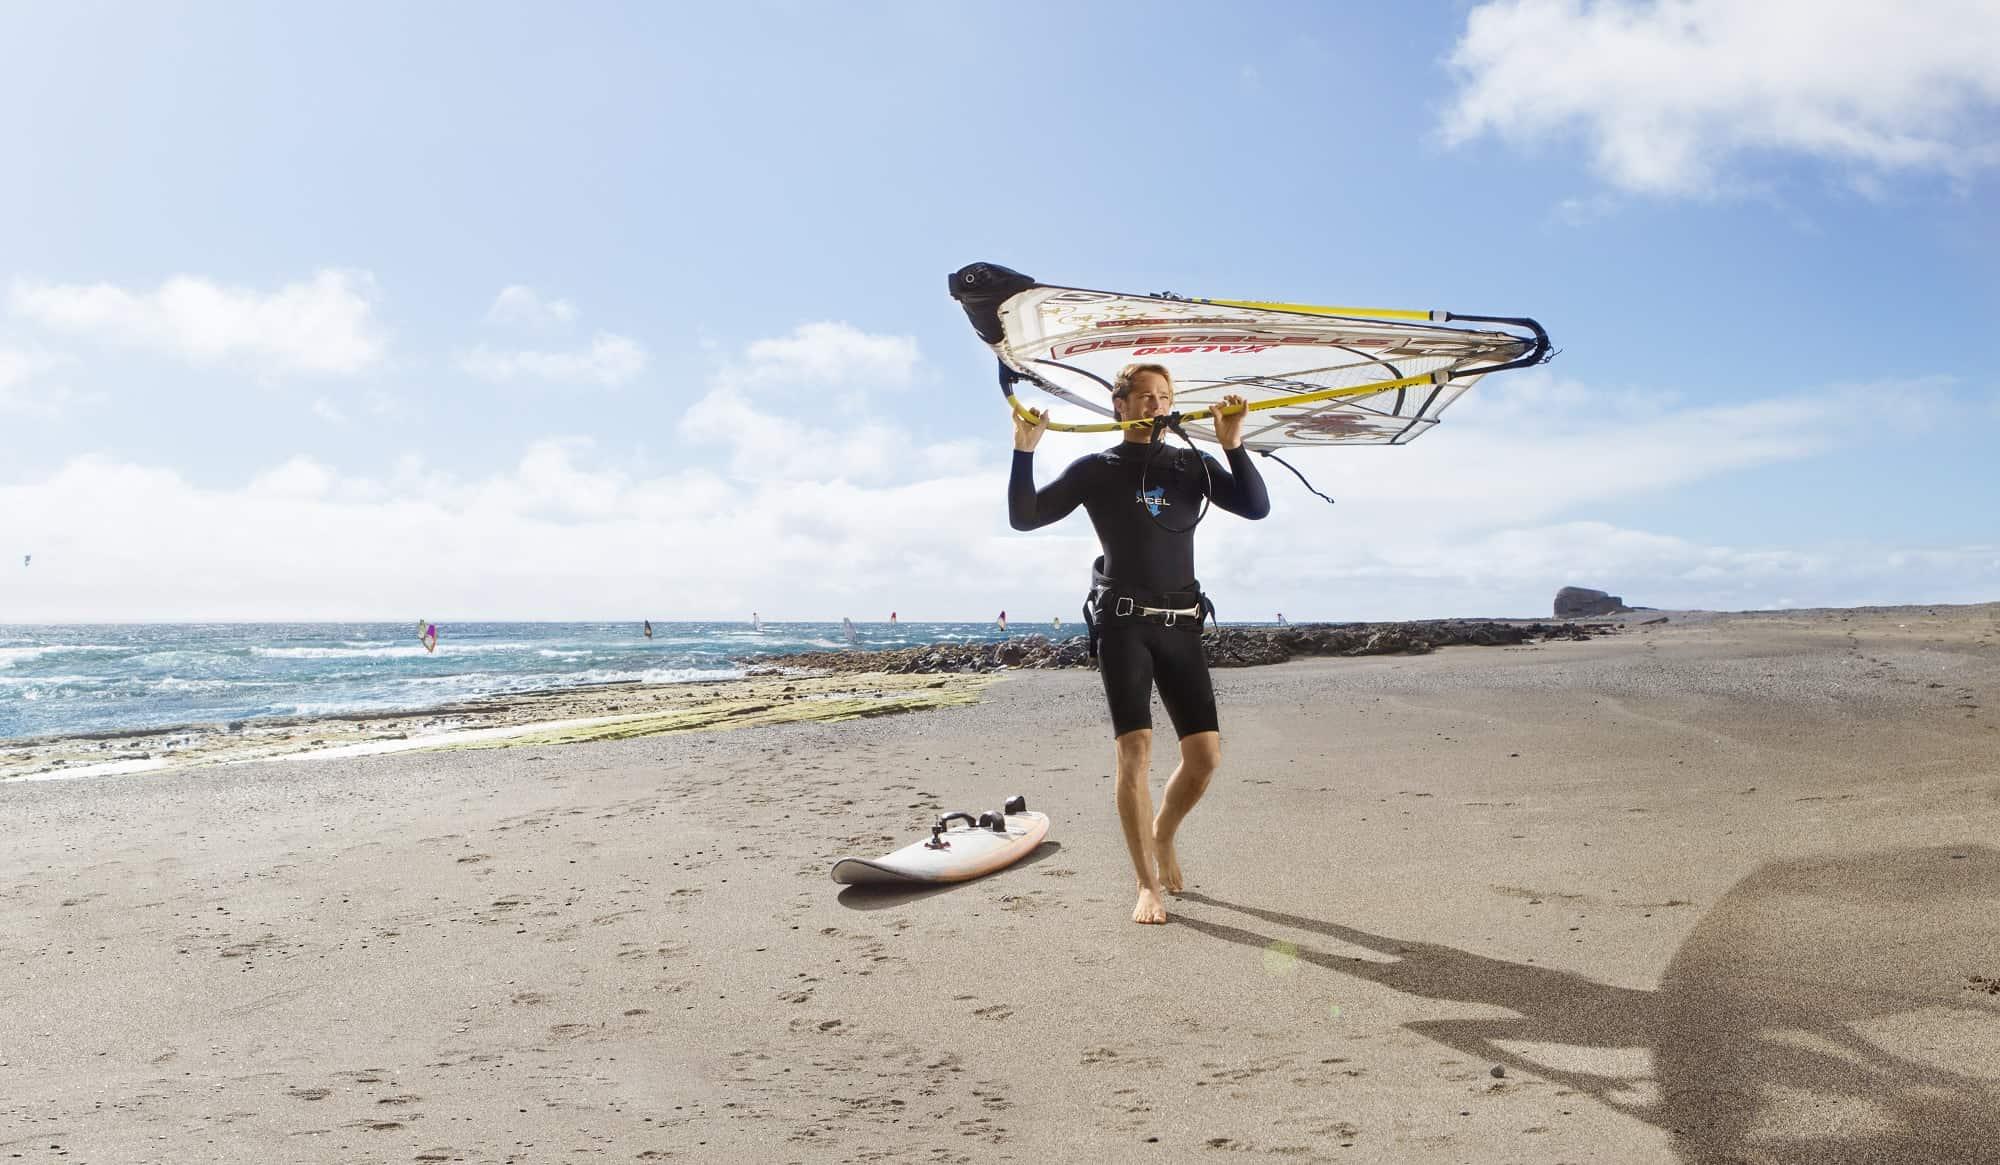 Extreme Sport op de Canarische eilanden